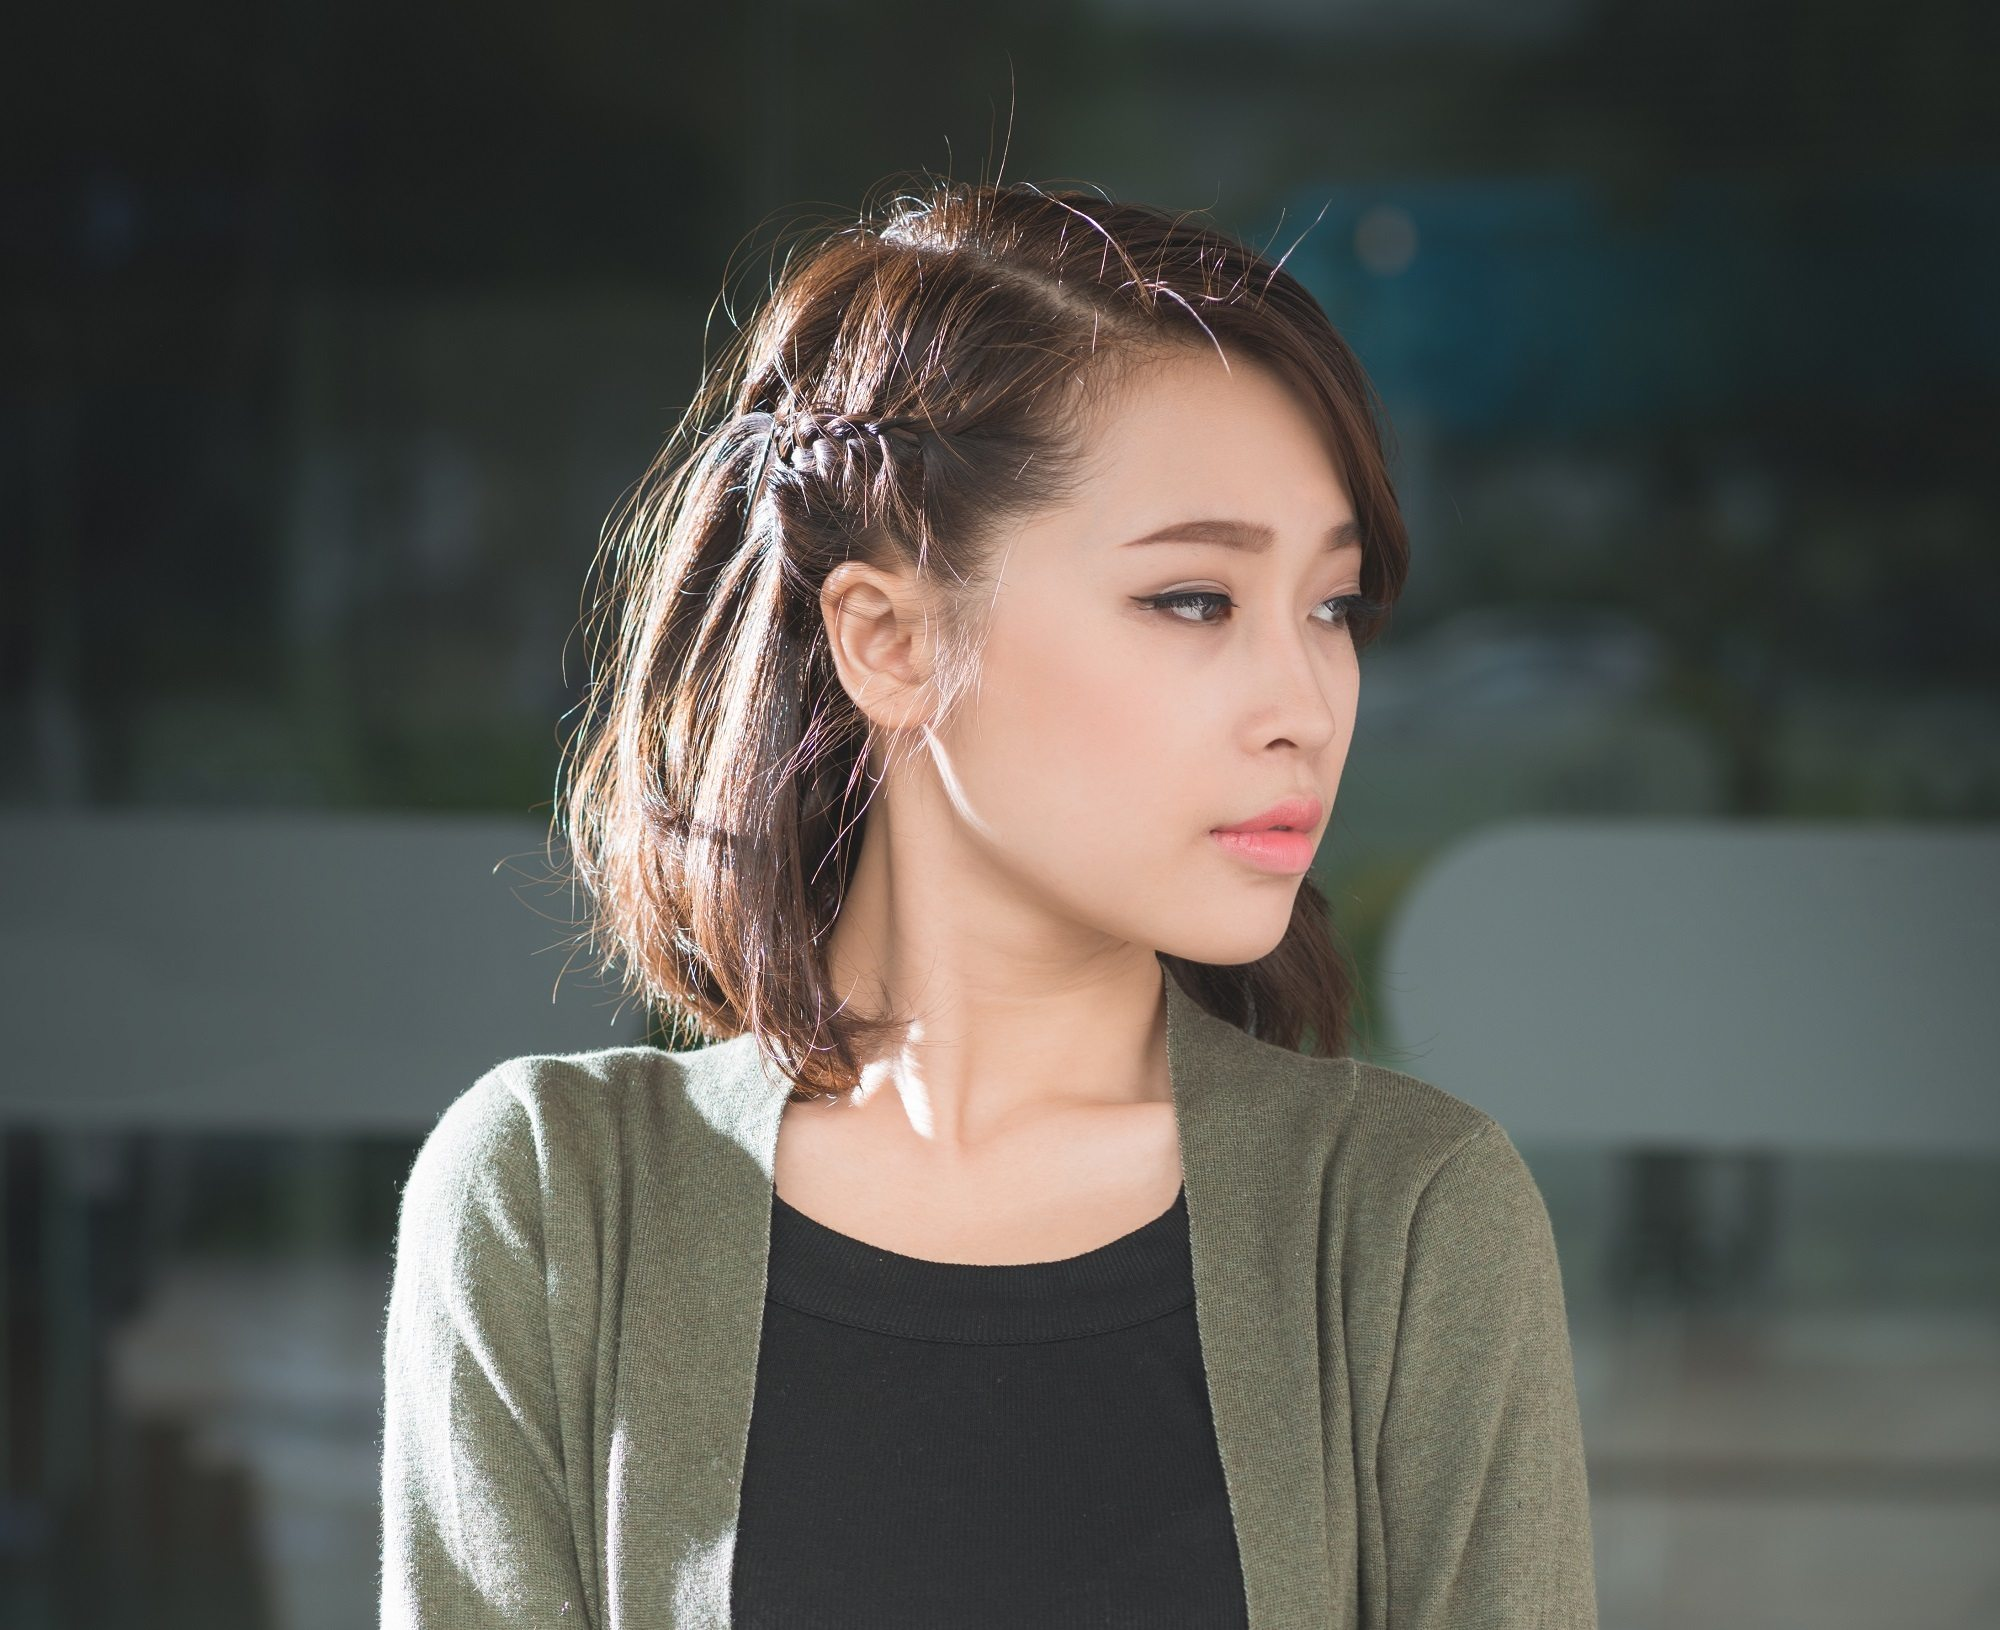 Closeup shot of a Vietnamese woman with short dark hair